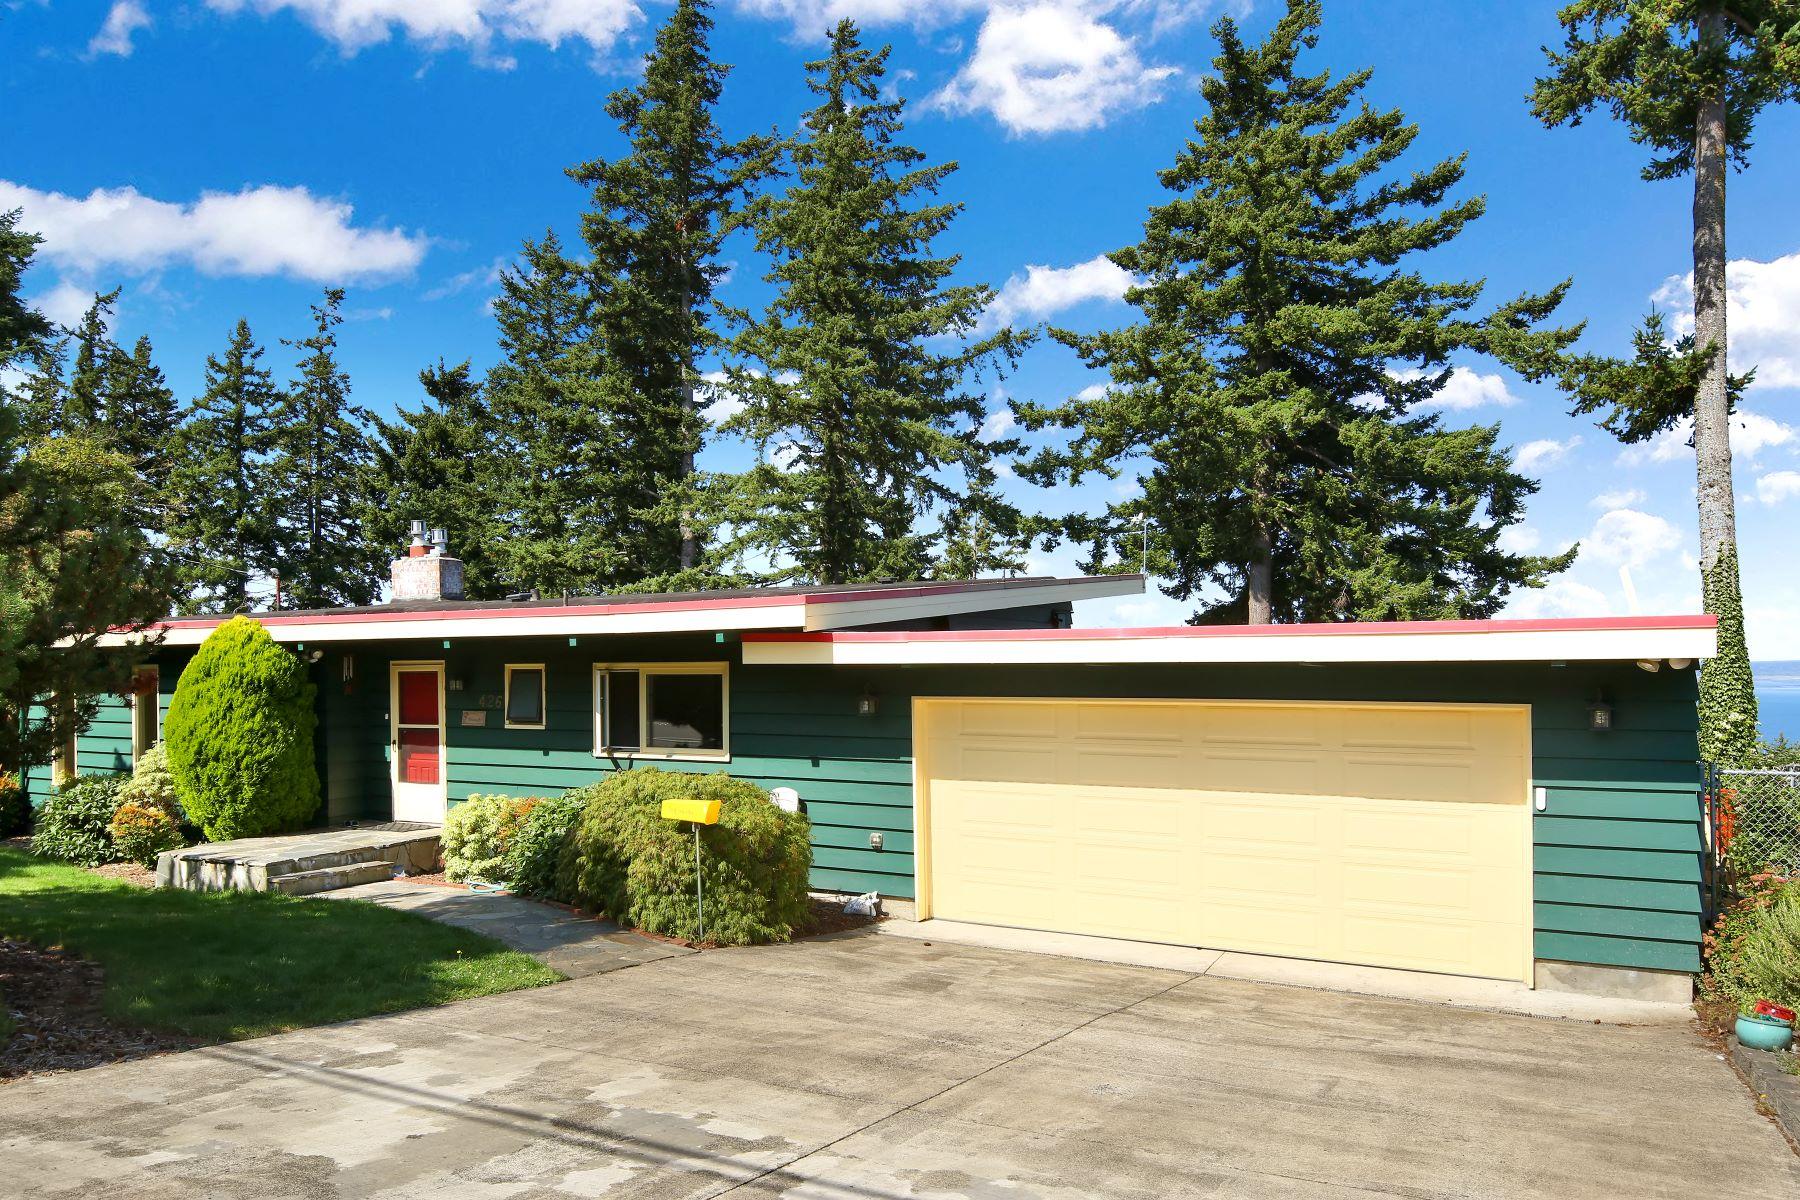 Single Family Homes for Sale at Midcentury Masterpiece 426 Highland Dr Bellingham, Washington 98225 United States